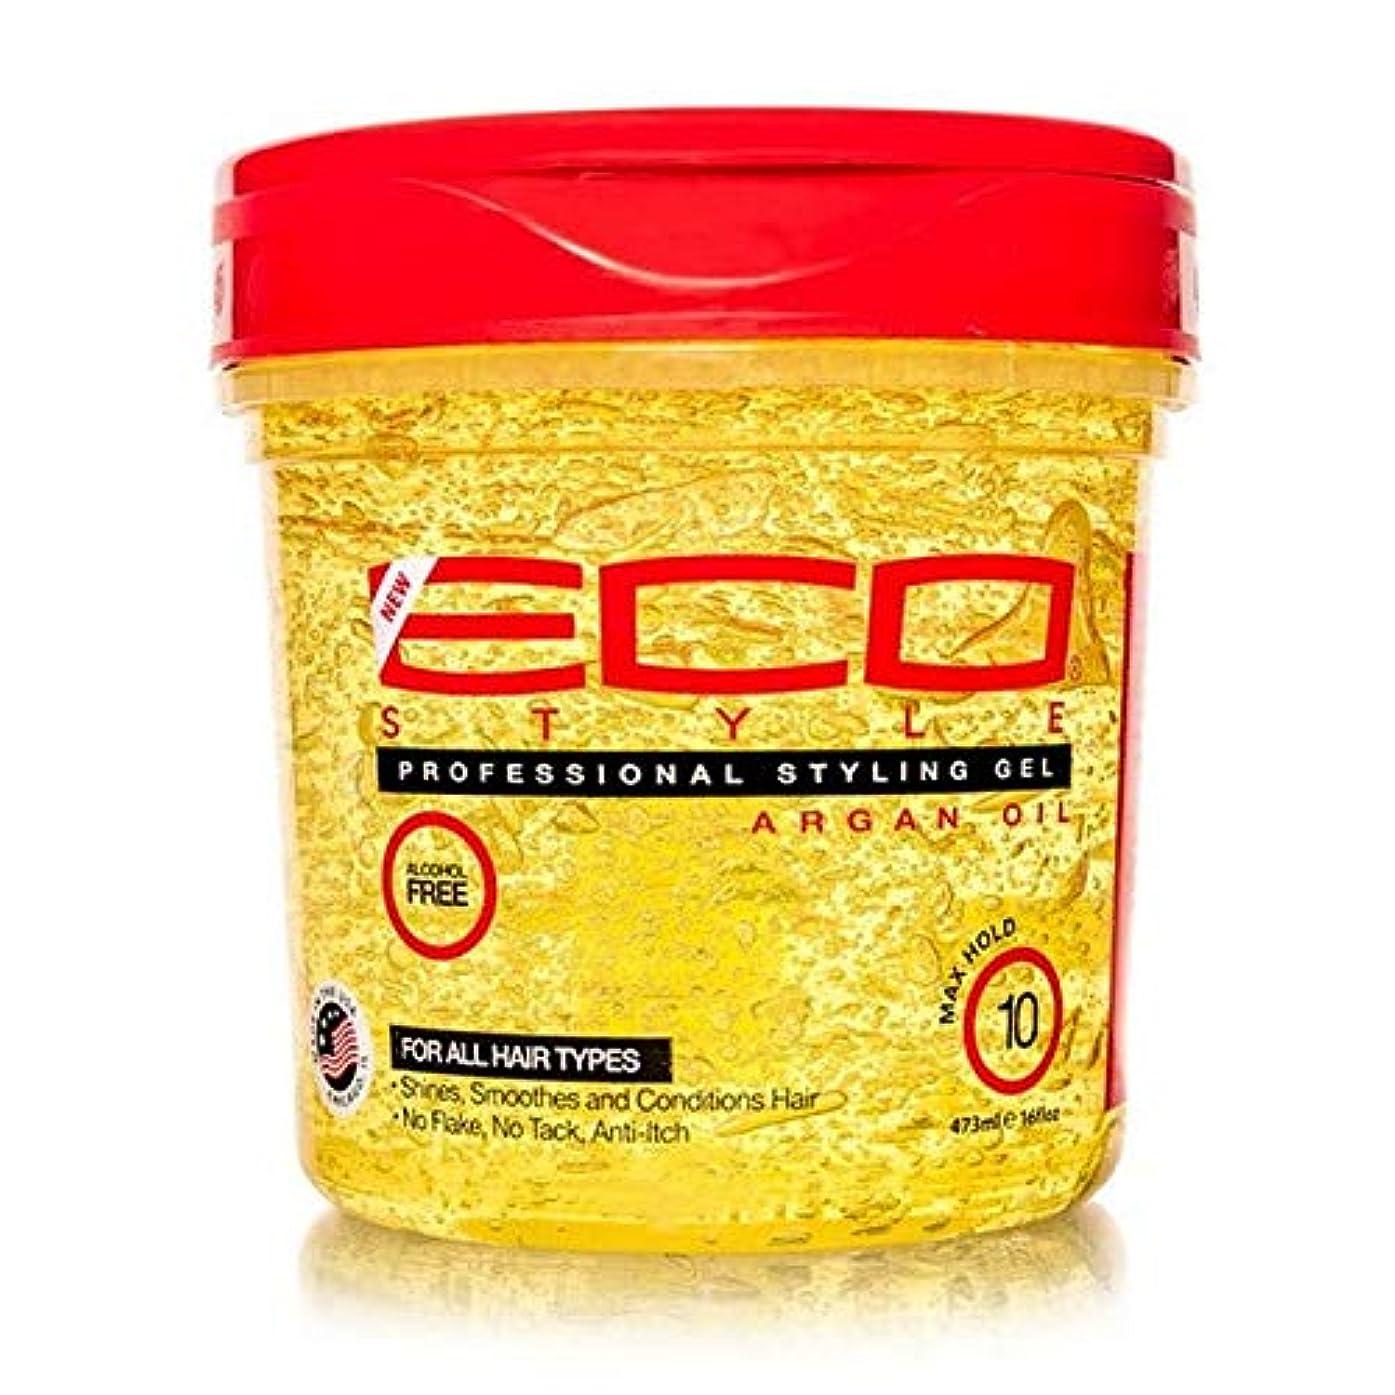 [ECO STYLER ] エコスタイラモロッコアルガン油スタイリングゲル473ミリリットル - ECO Styler Moroccan Argan Oil Styling Gel 473ml [並行輸入品]